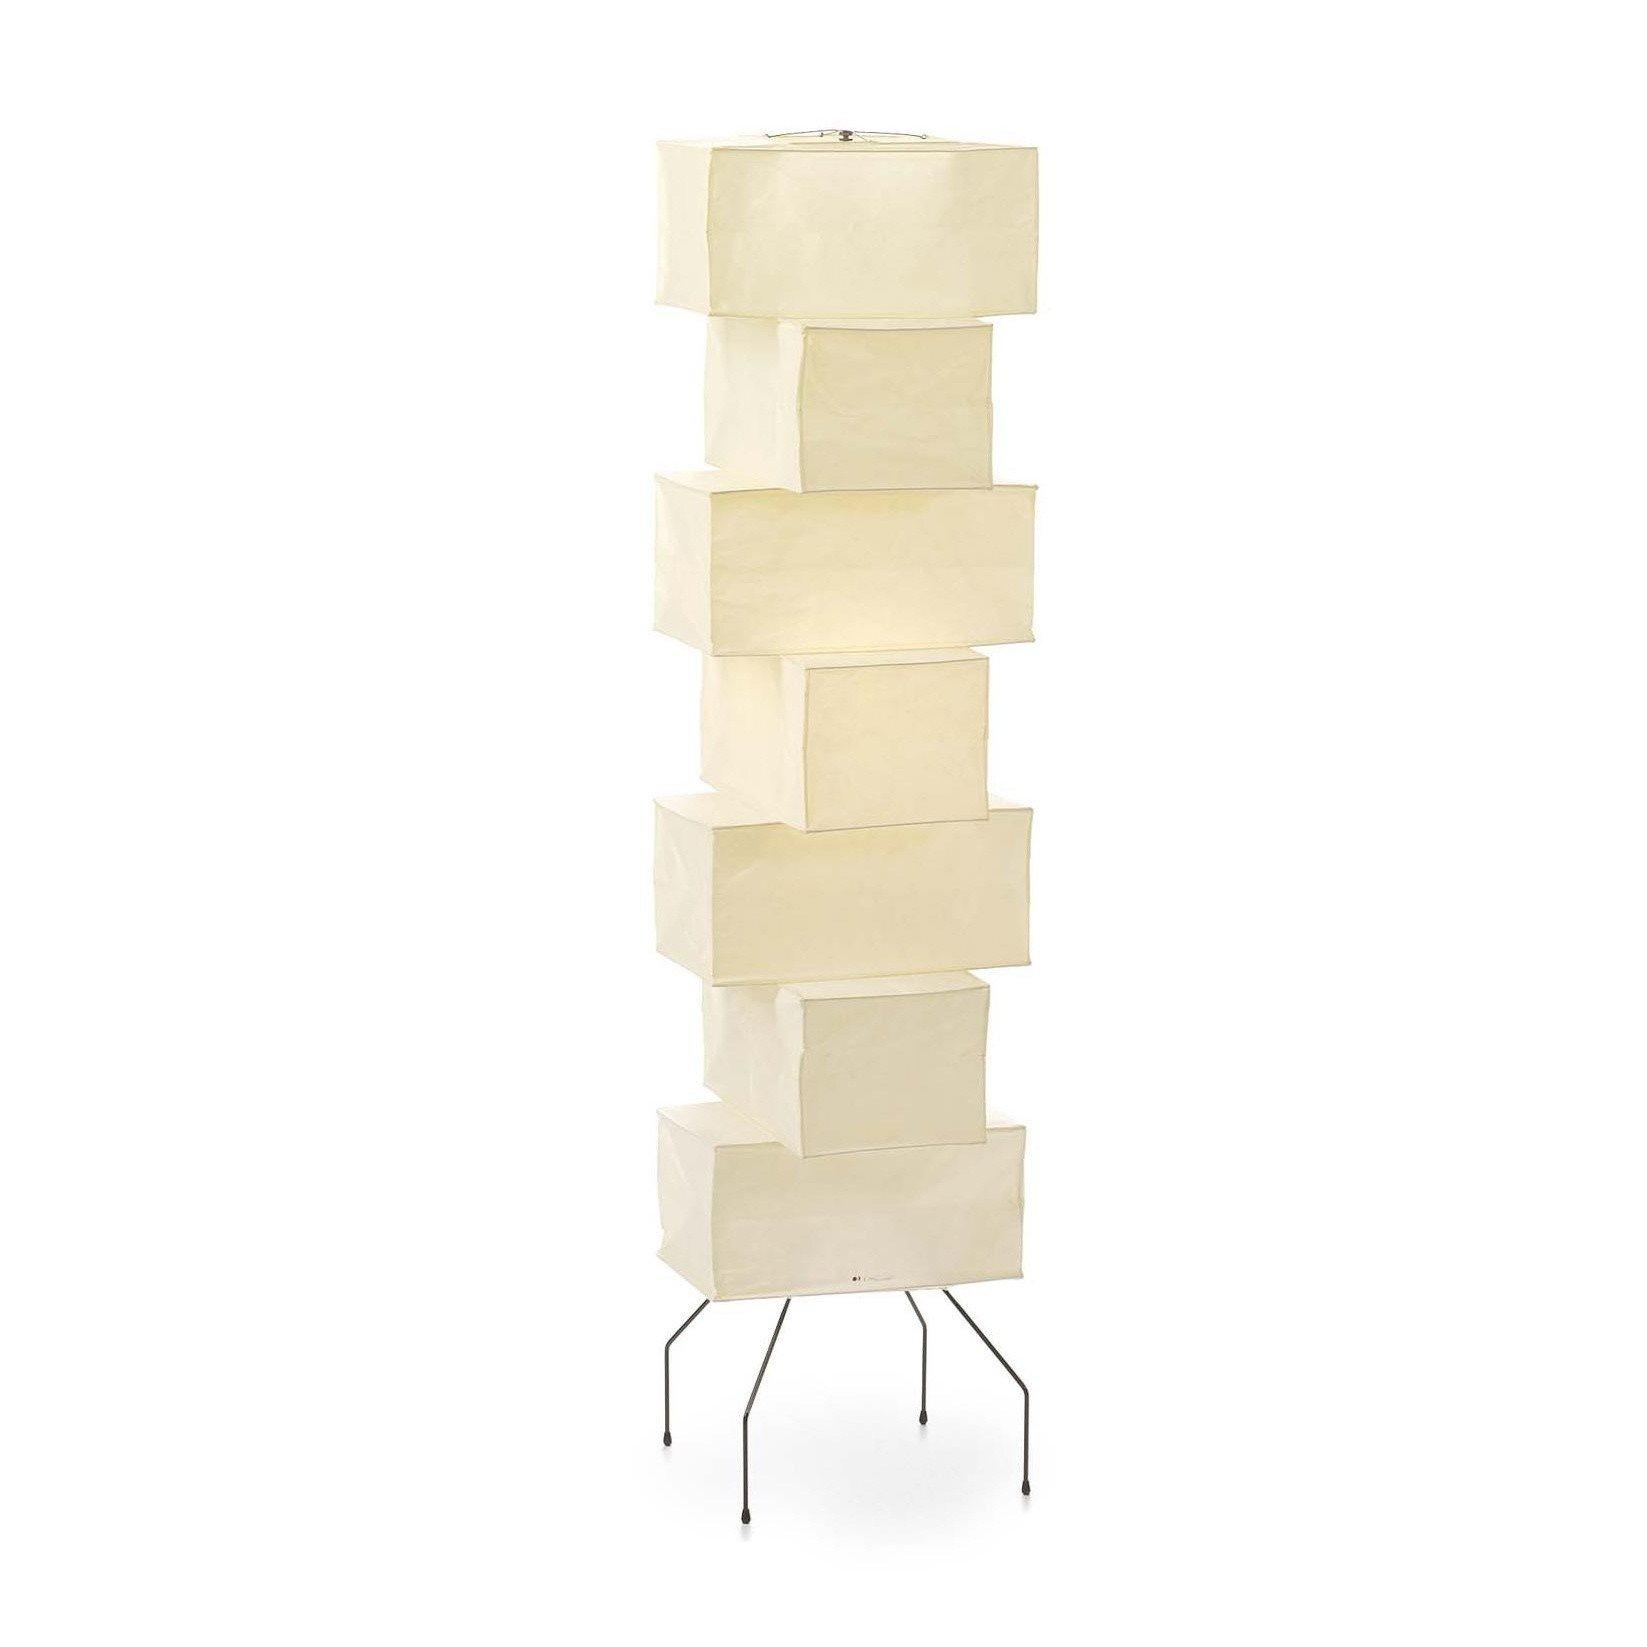 Vitra akari uf4 l10 floor lamp ambientedirect vitra akari uf4 l10 floor lamp paperframe aloadofball Images